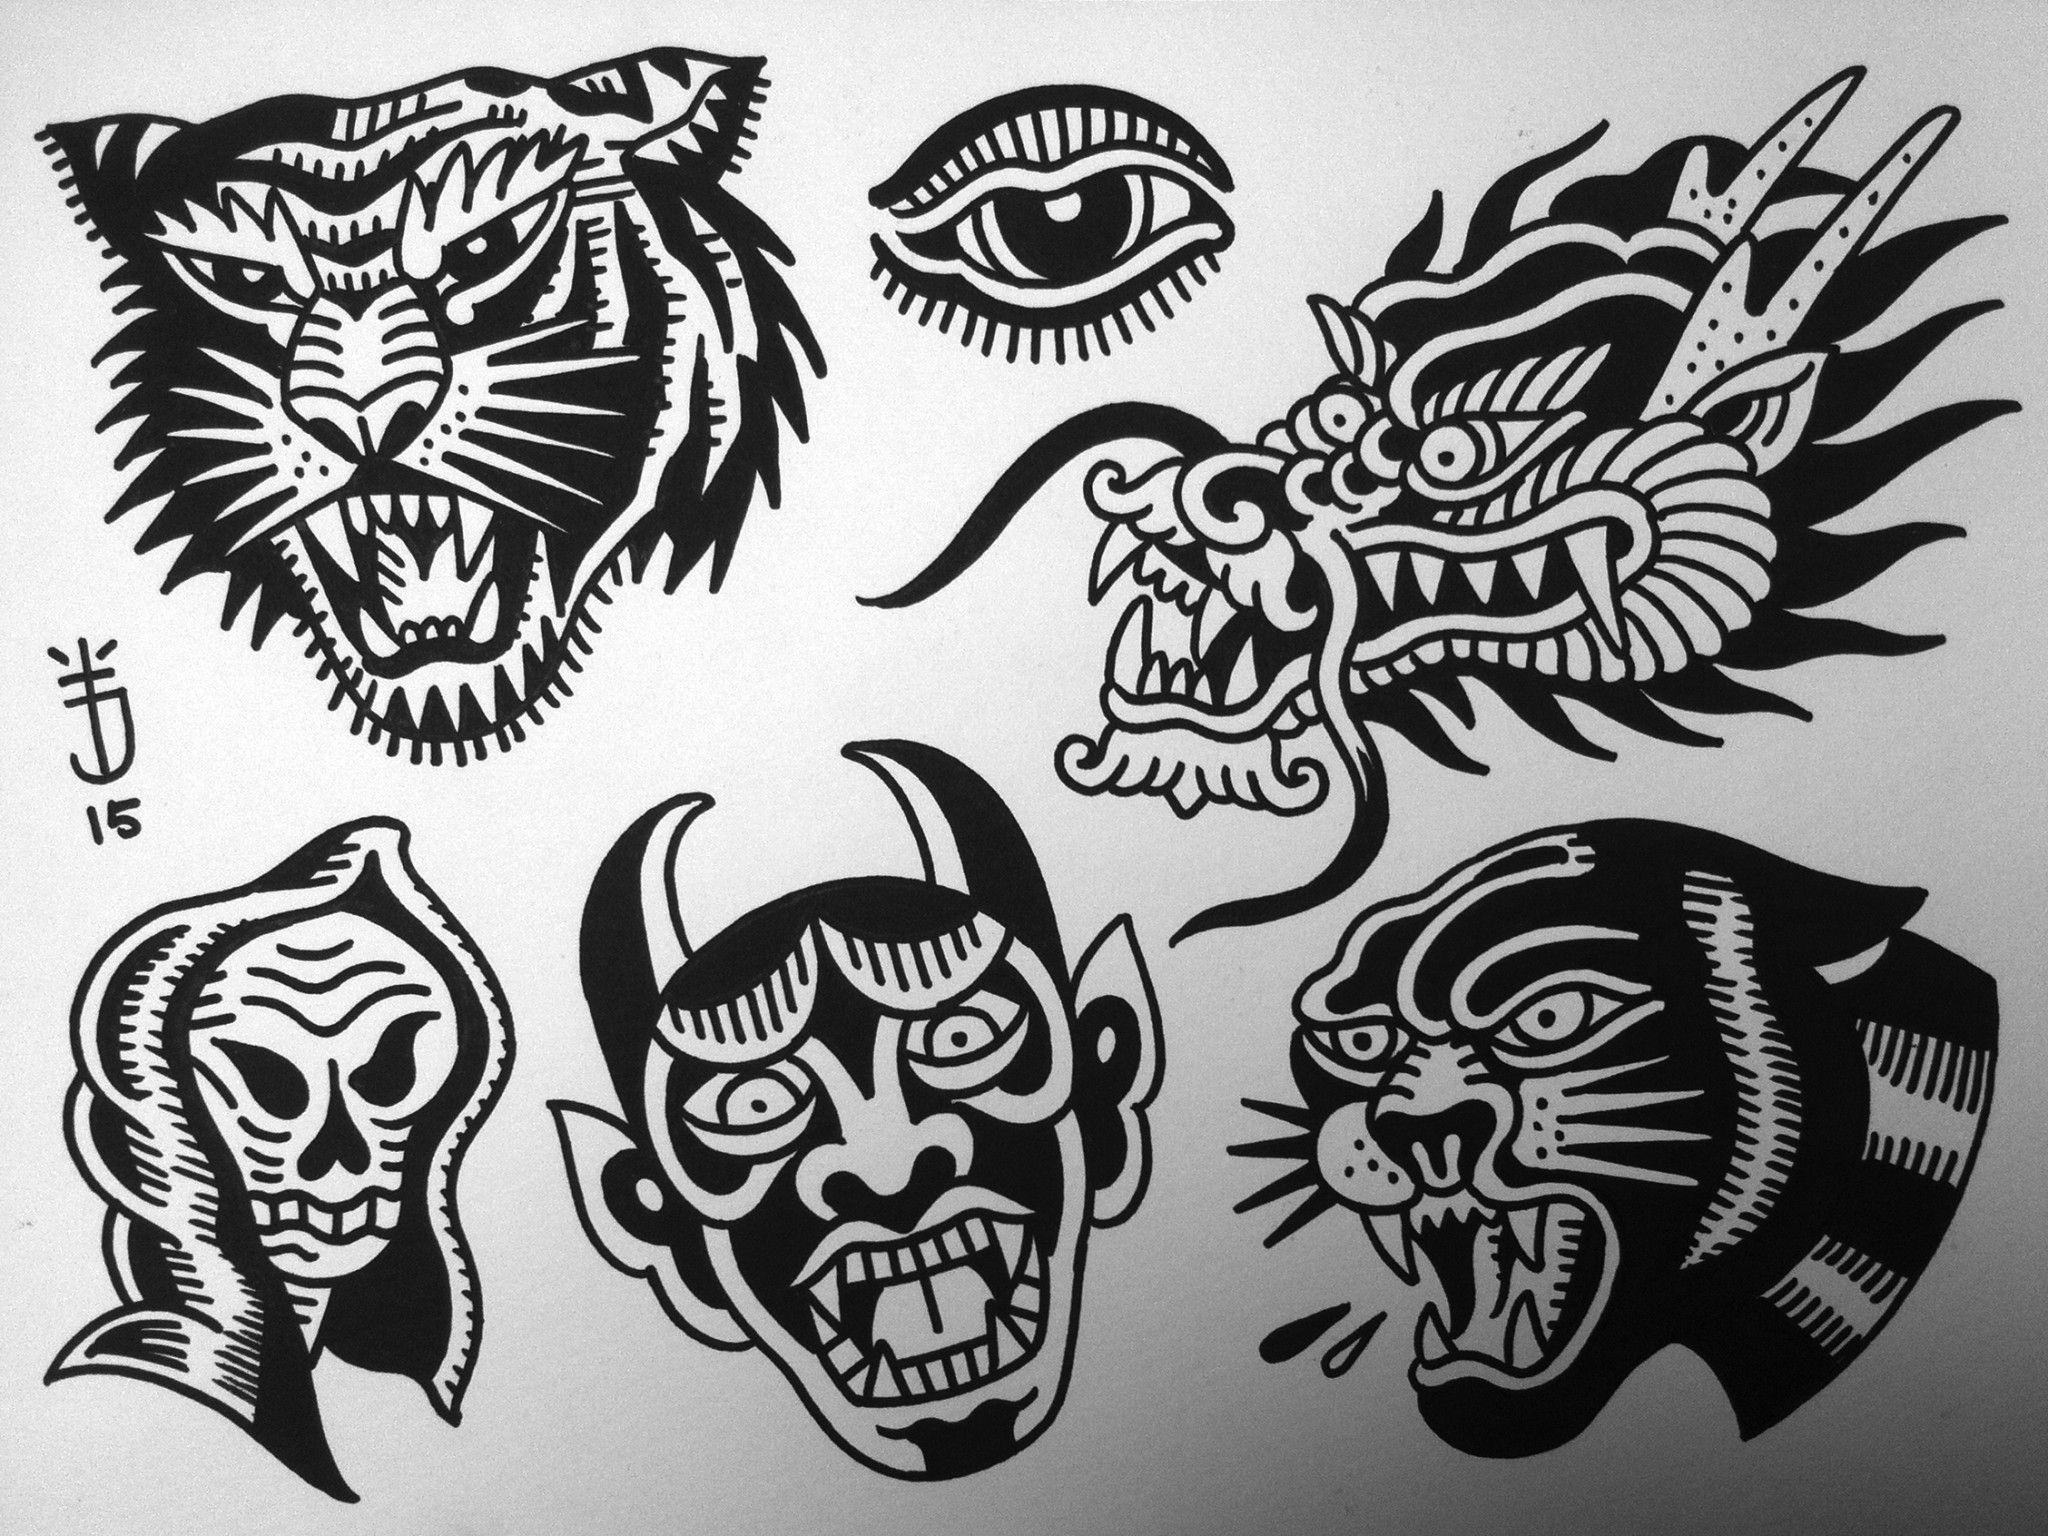 Planche Tatouage Old School Tattoo Joris Flash Tigre Dragon